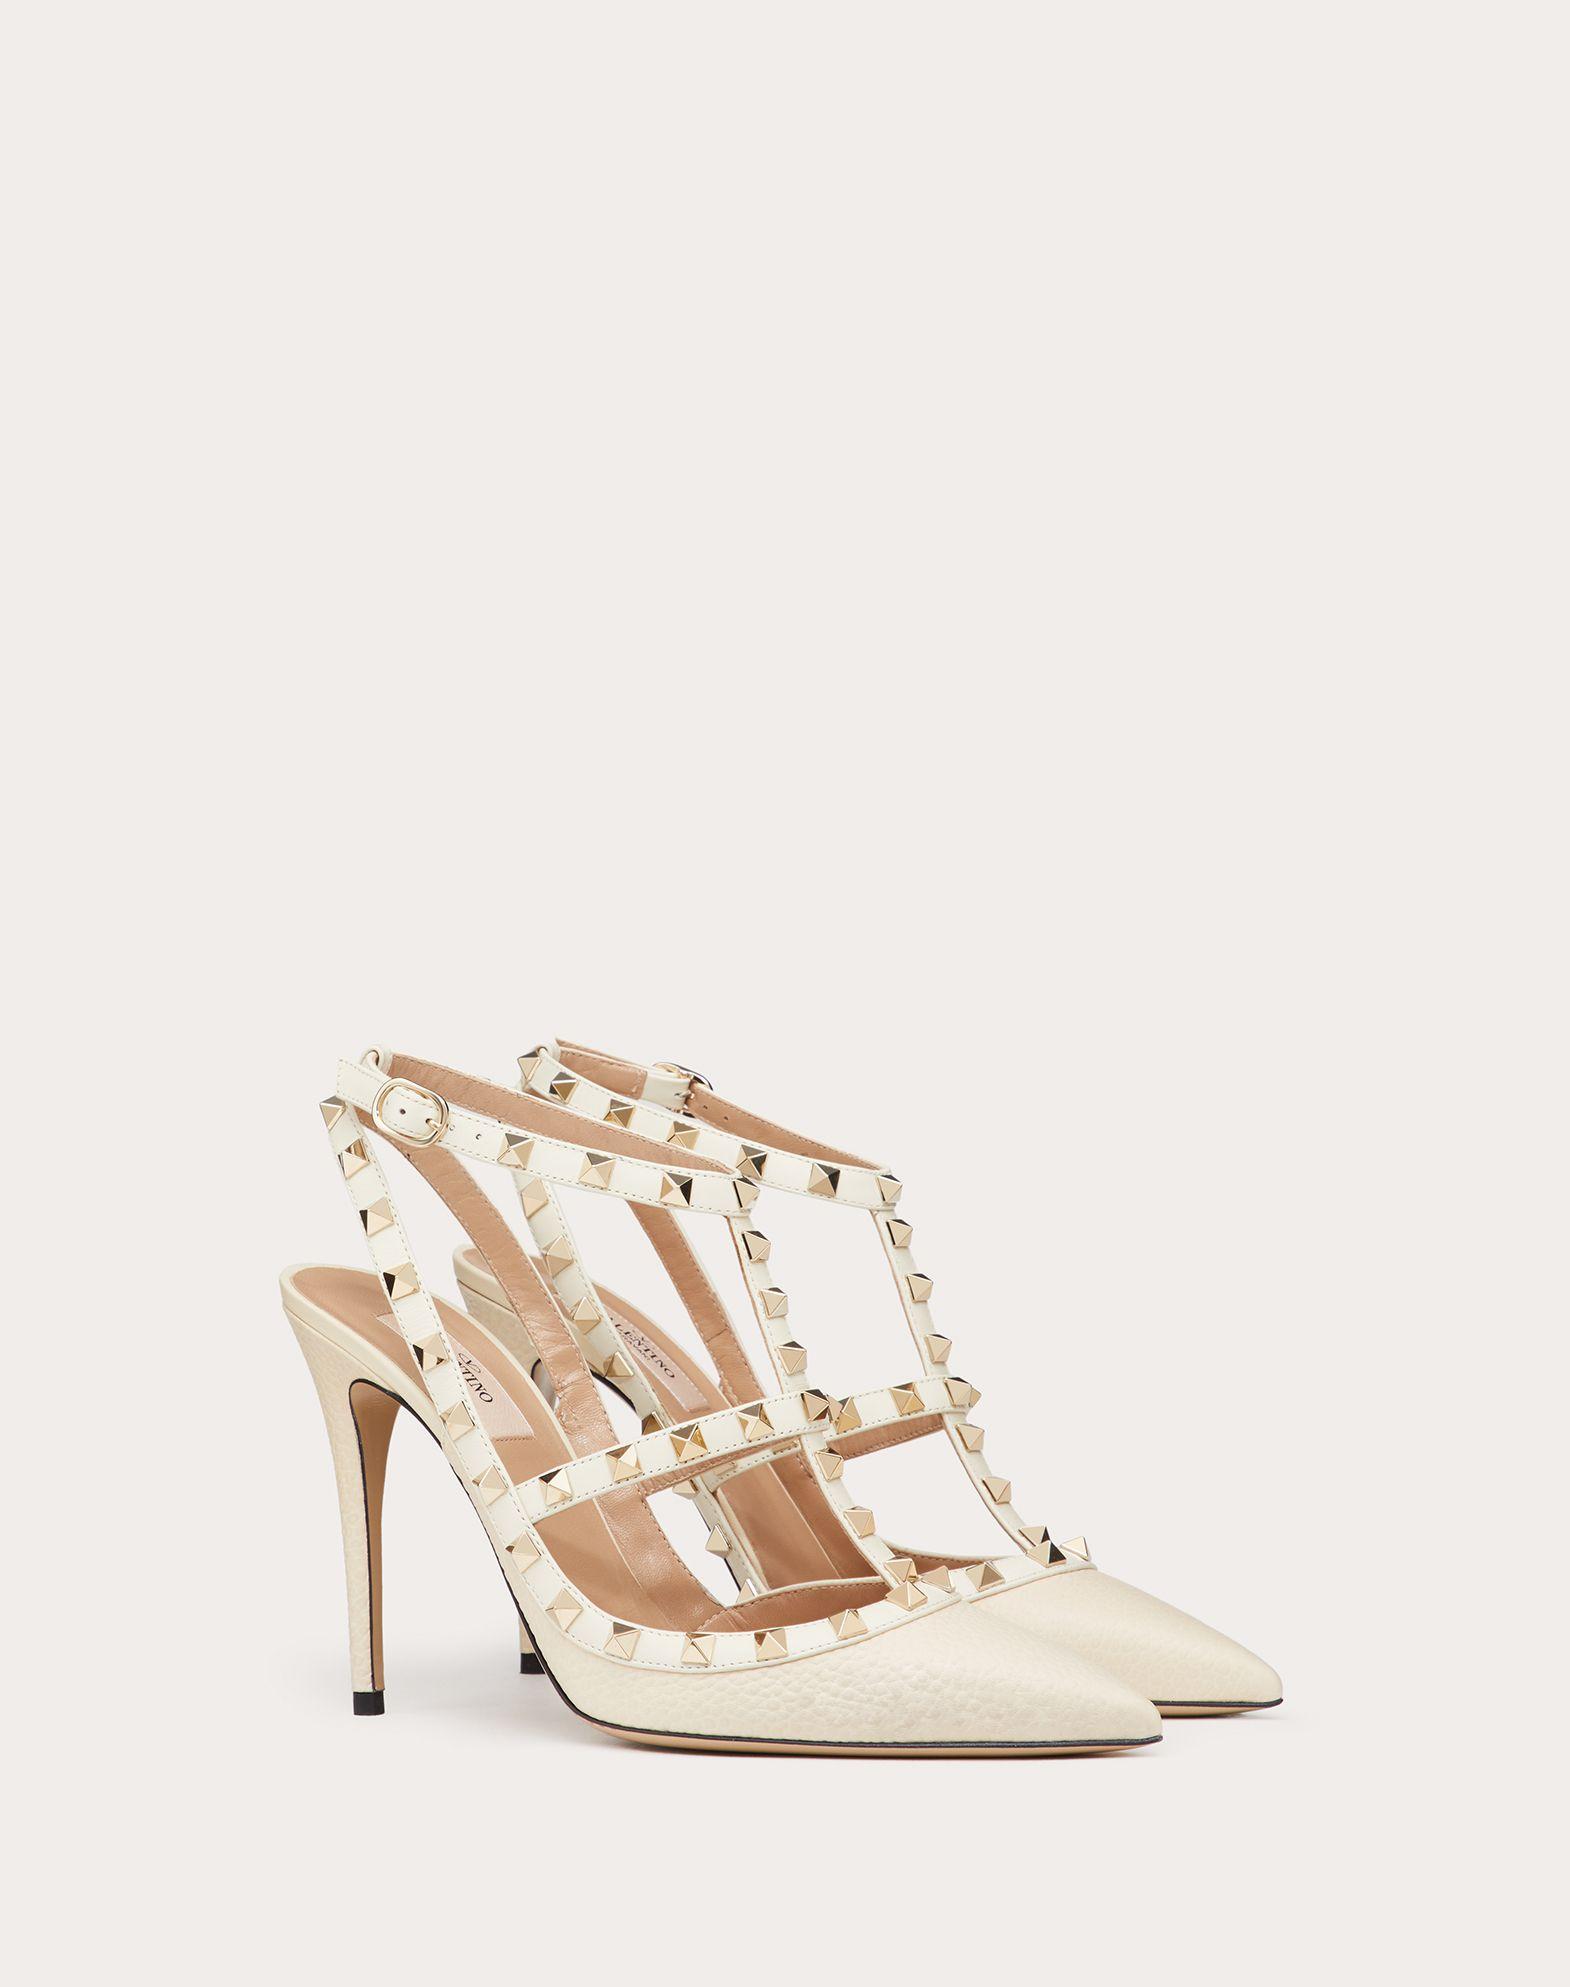 VALENTINO GARAVANI Rockstud Ankle Strap HIGH HEEL PUMPS D r